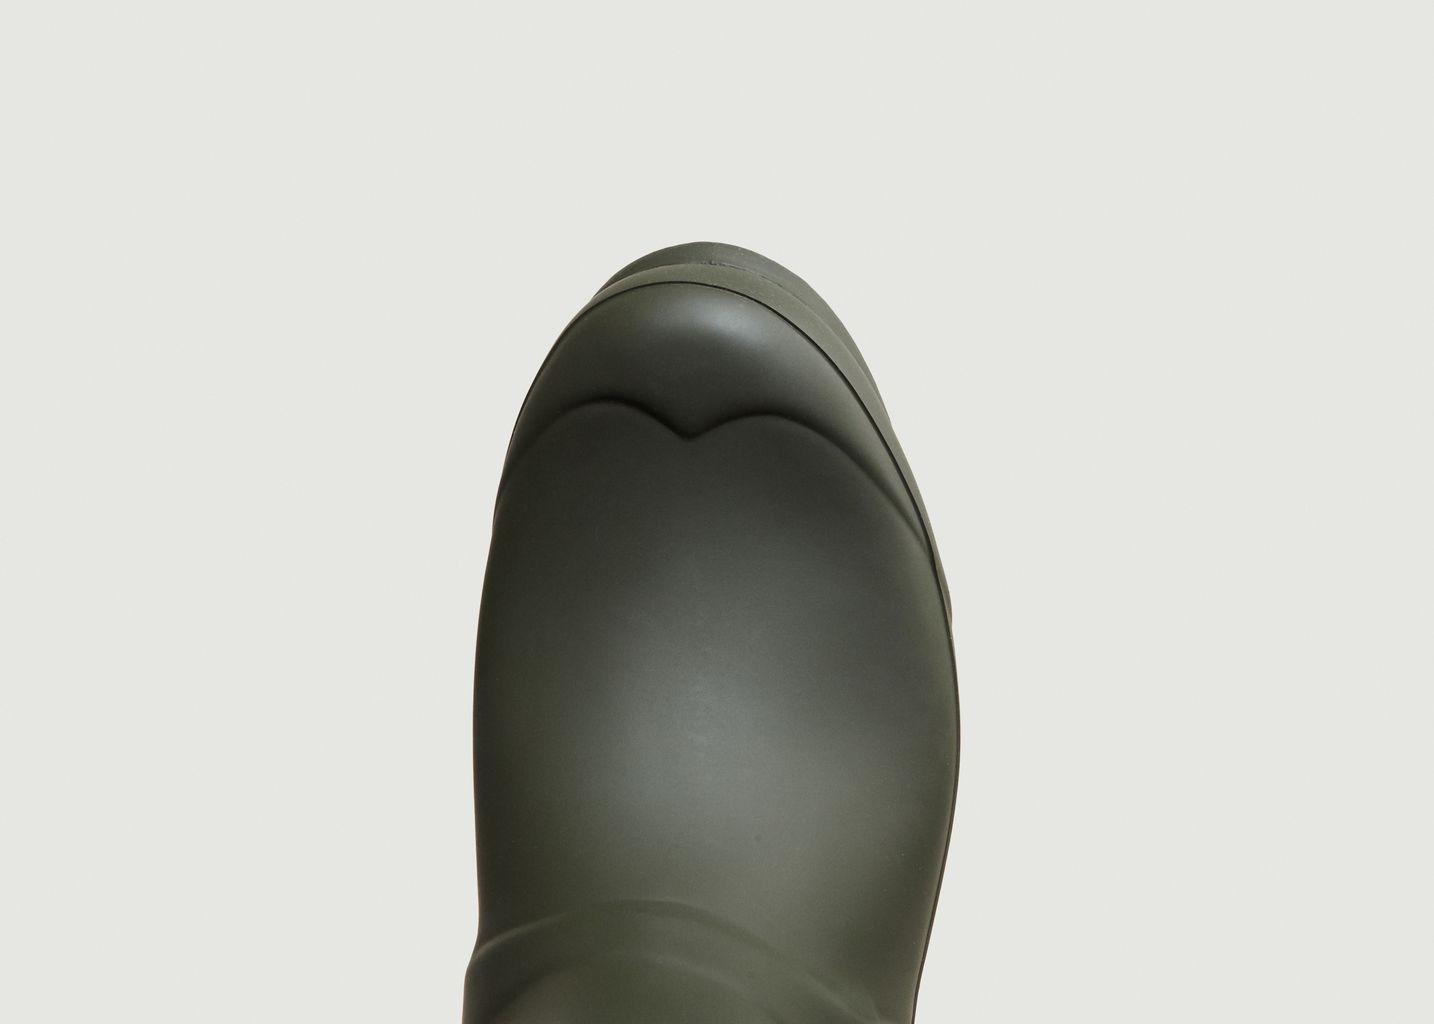 Bottes Hautes Original - Hunter